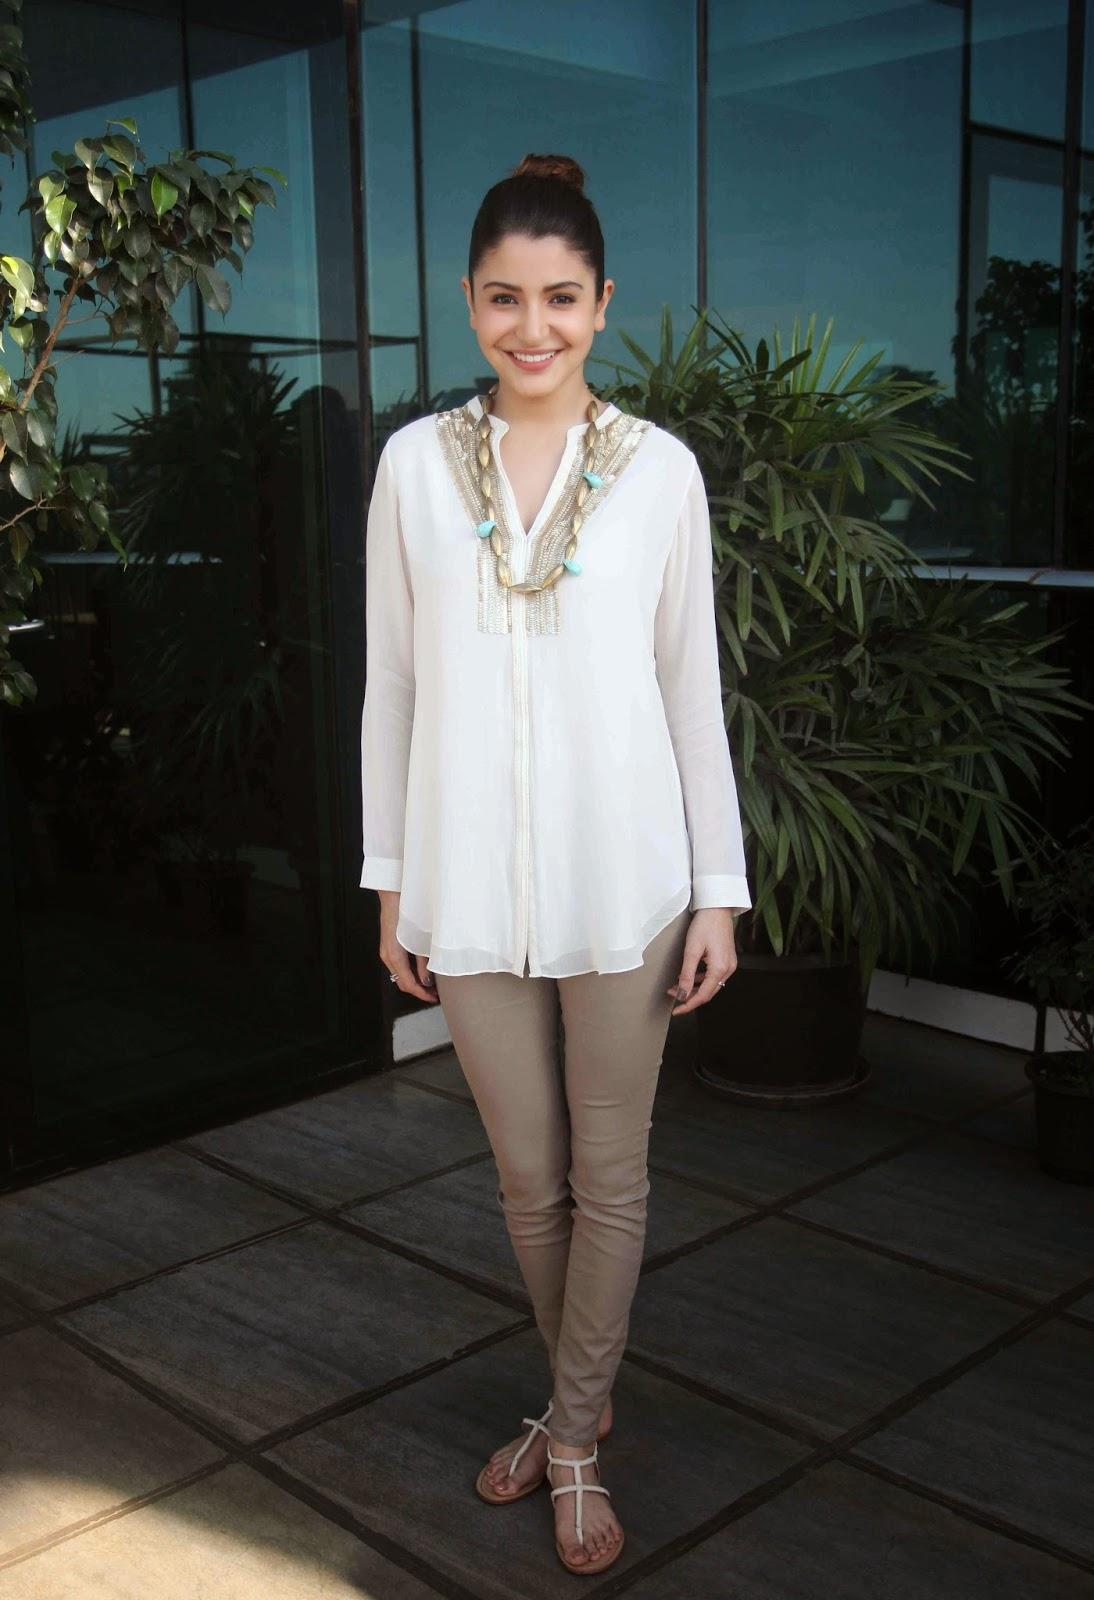 Indian Actress Anushka Sharma Hot Photoshoot In White Dress